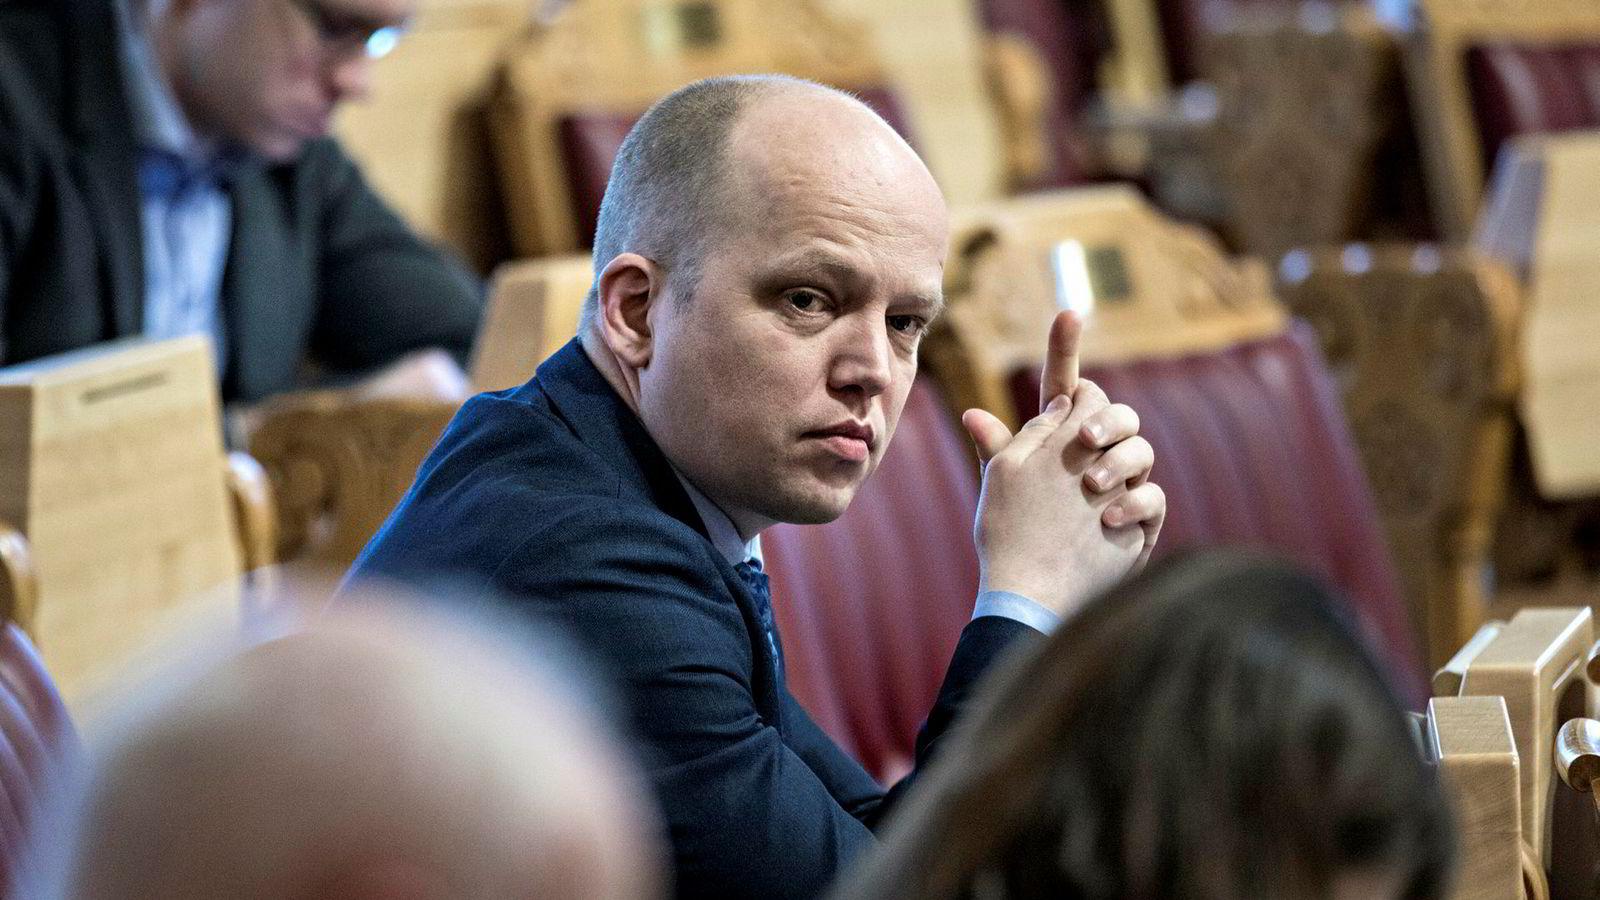 Sp-leder Trygve Slagsvold Vedum opplever uro i partiet for at det ikke tar klimaproblemet på alvor.